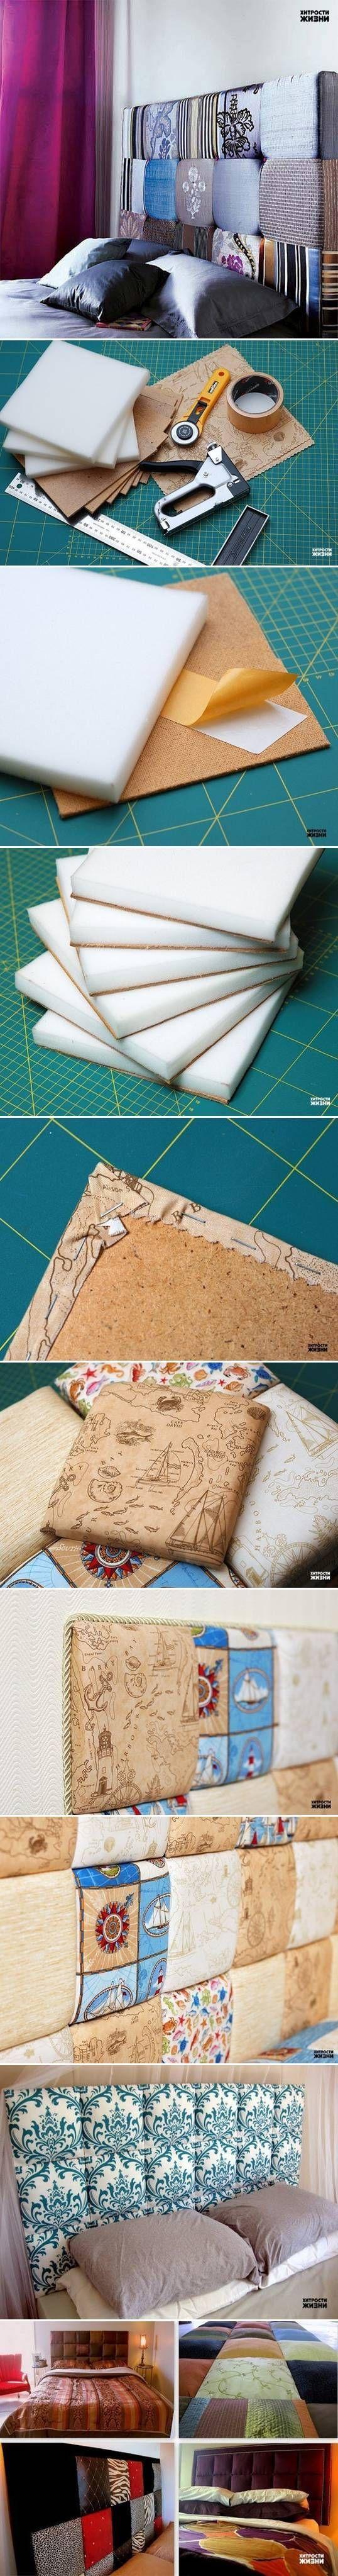 DIY Soft Bed Headboard DIY Projects | UsefulDIY.com Follow us on Facebook ==> https://www.facebook.com/UsefulDiy